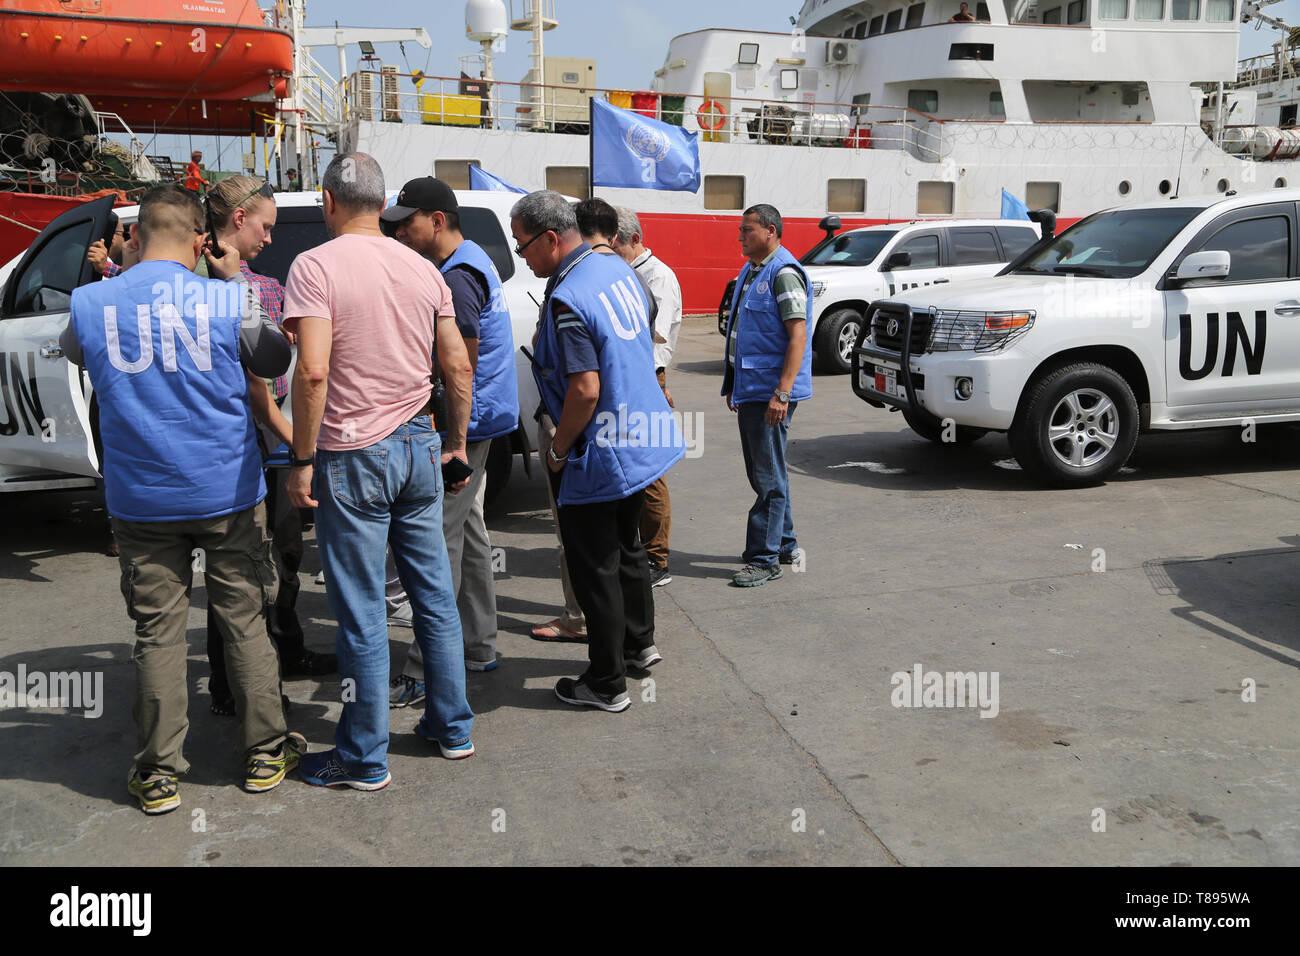 (190511) -- HODEIDAH (YEMEN), May 11, 2019 (Xinhua) -- UN monitoring team members are seen at the Hodeidah main port in Hodeidah, Yemen, on May 11, 2019. Yemen's Houthi rebels began on Saturday withdrawal from two ports of Hodeidah Province, eyewitnesses said. (Xinhua) Stock Photo